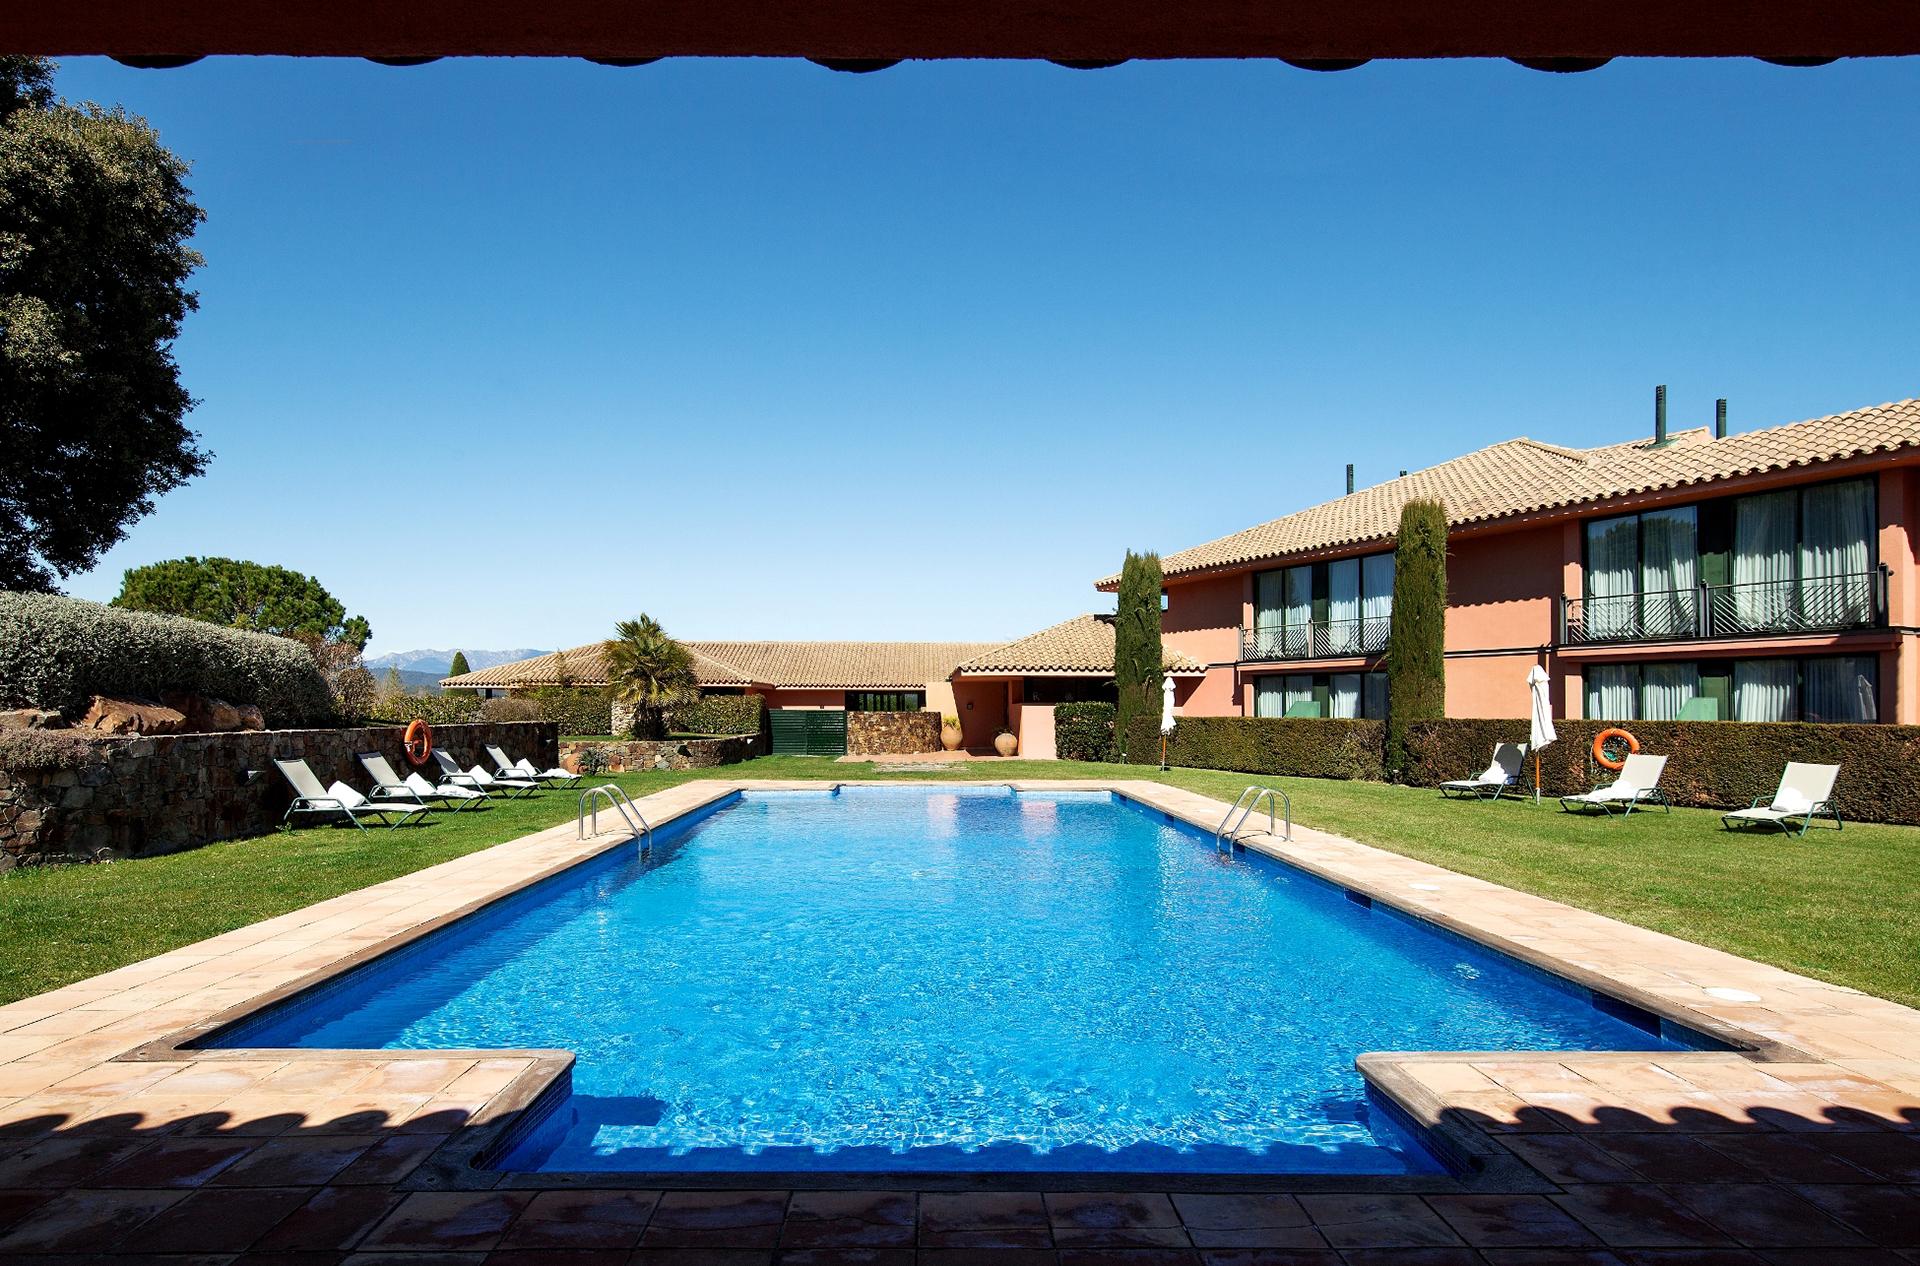 Golf-Expedition-Golf-reizen-Spanje-Regio-Barcelona-TorreMirona-Golf-&-Spa-Resort-pool-2